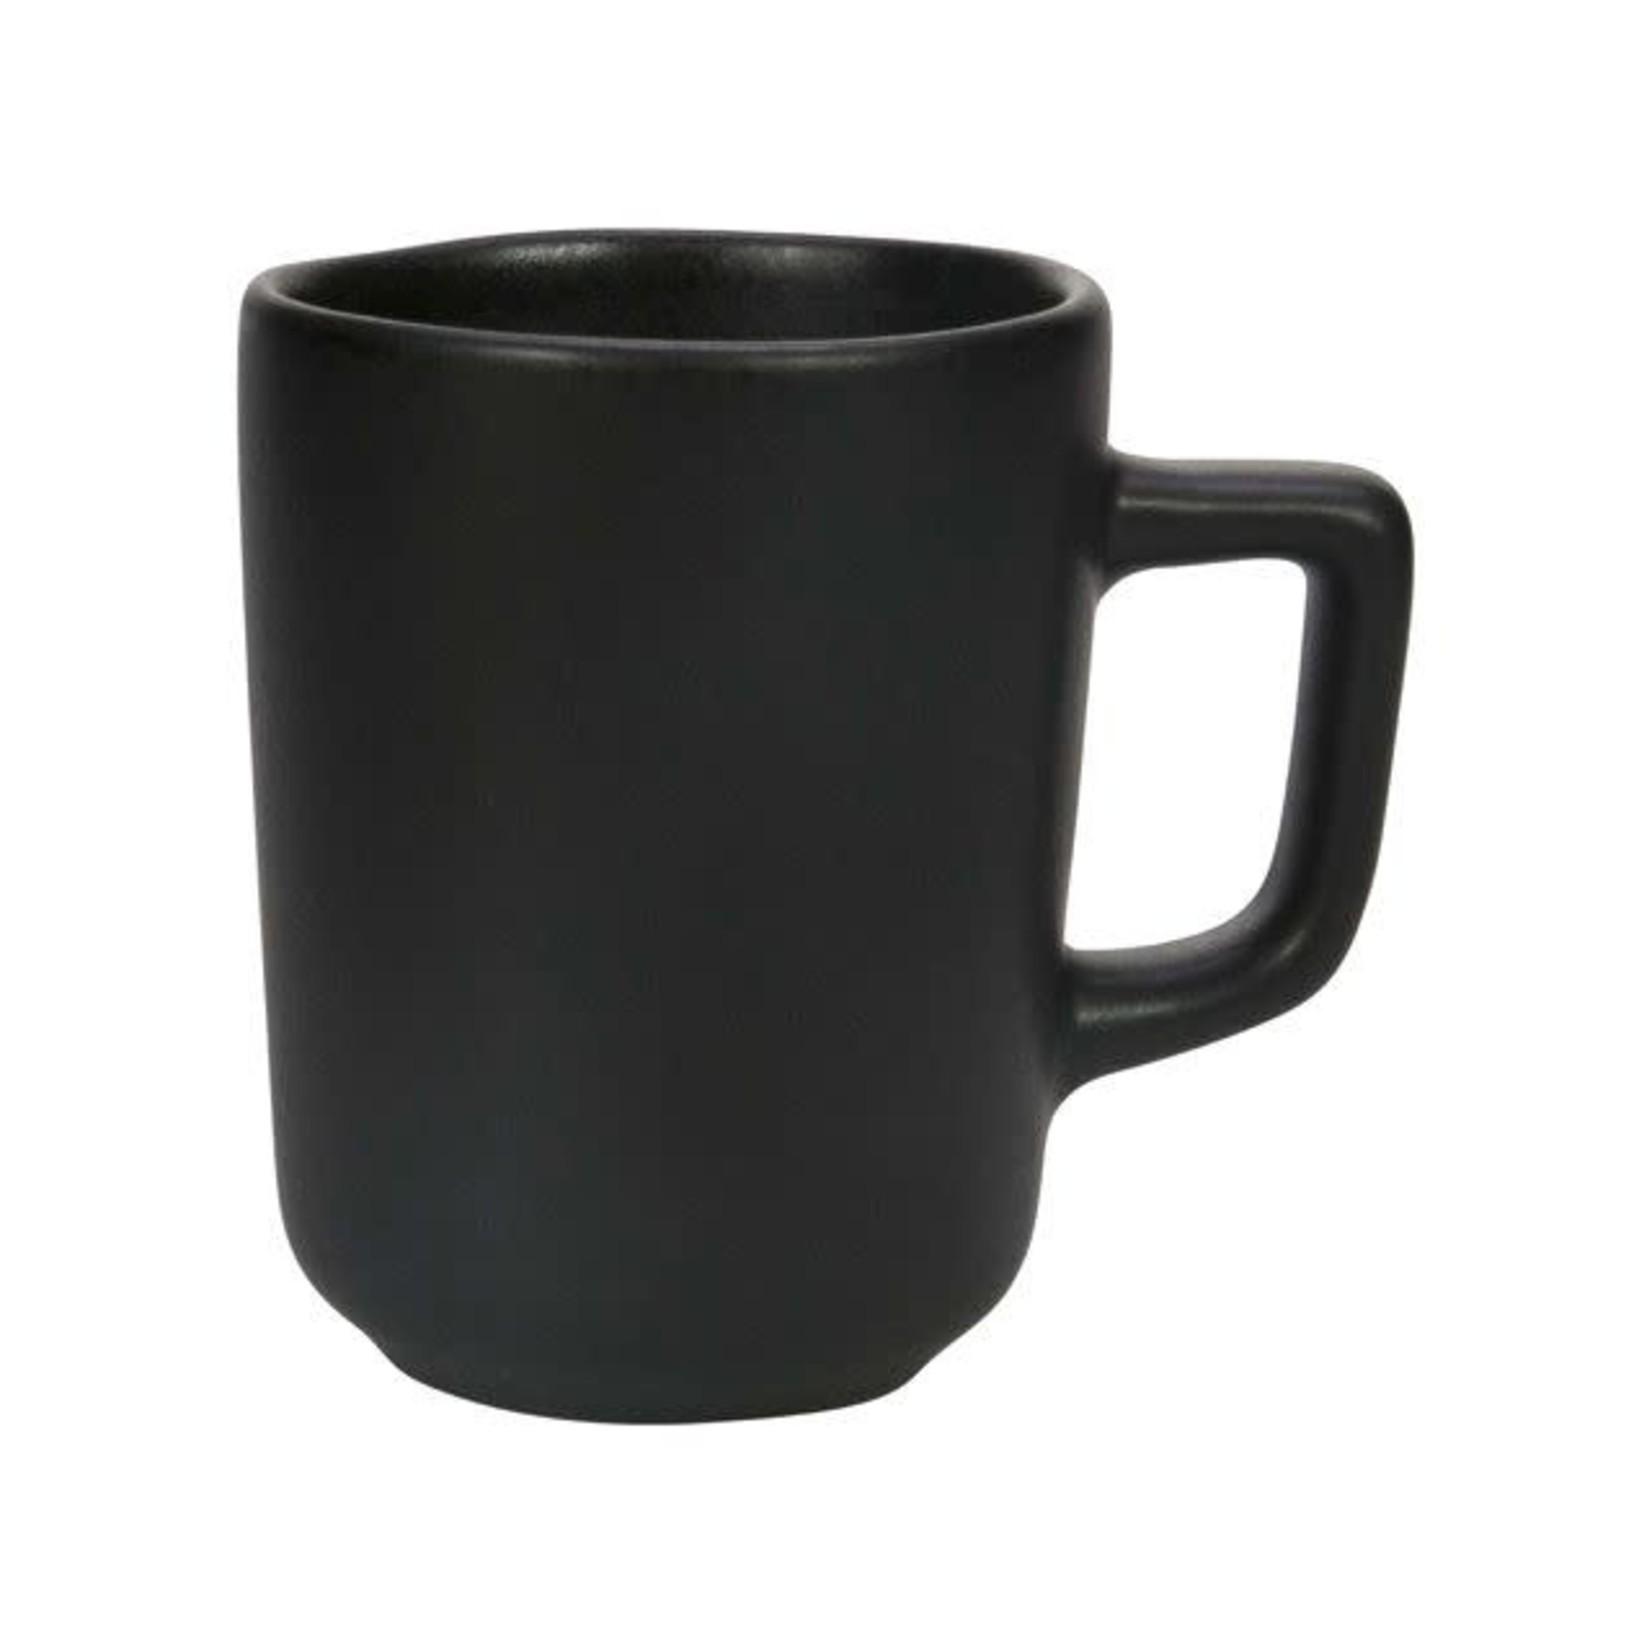 Gusta Espresso beker FIKA 5x6,5cm Zwart